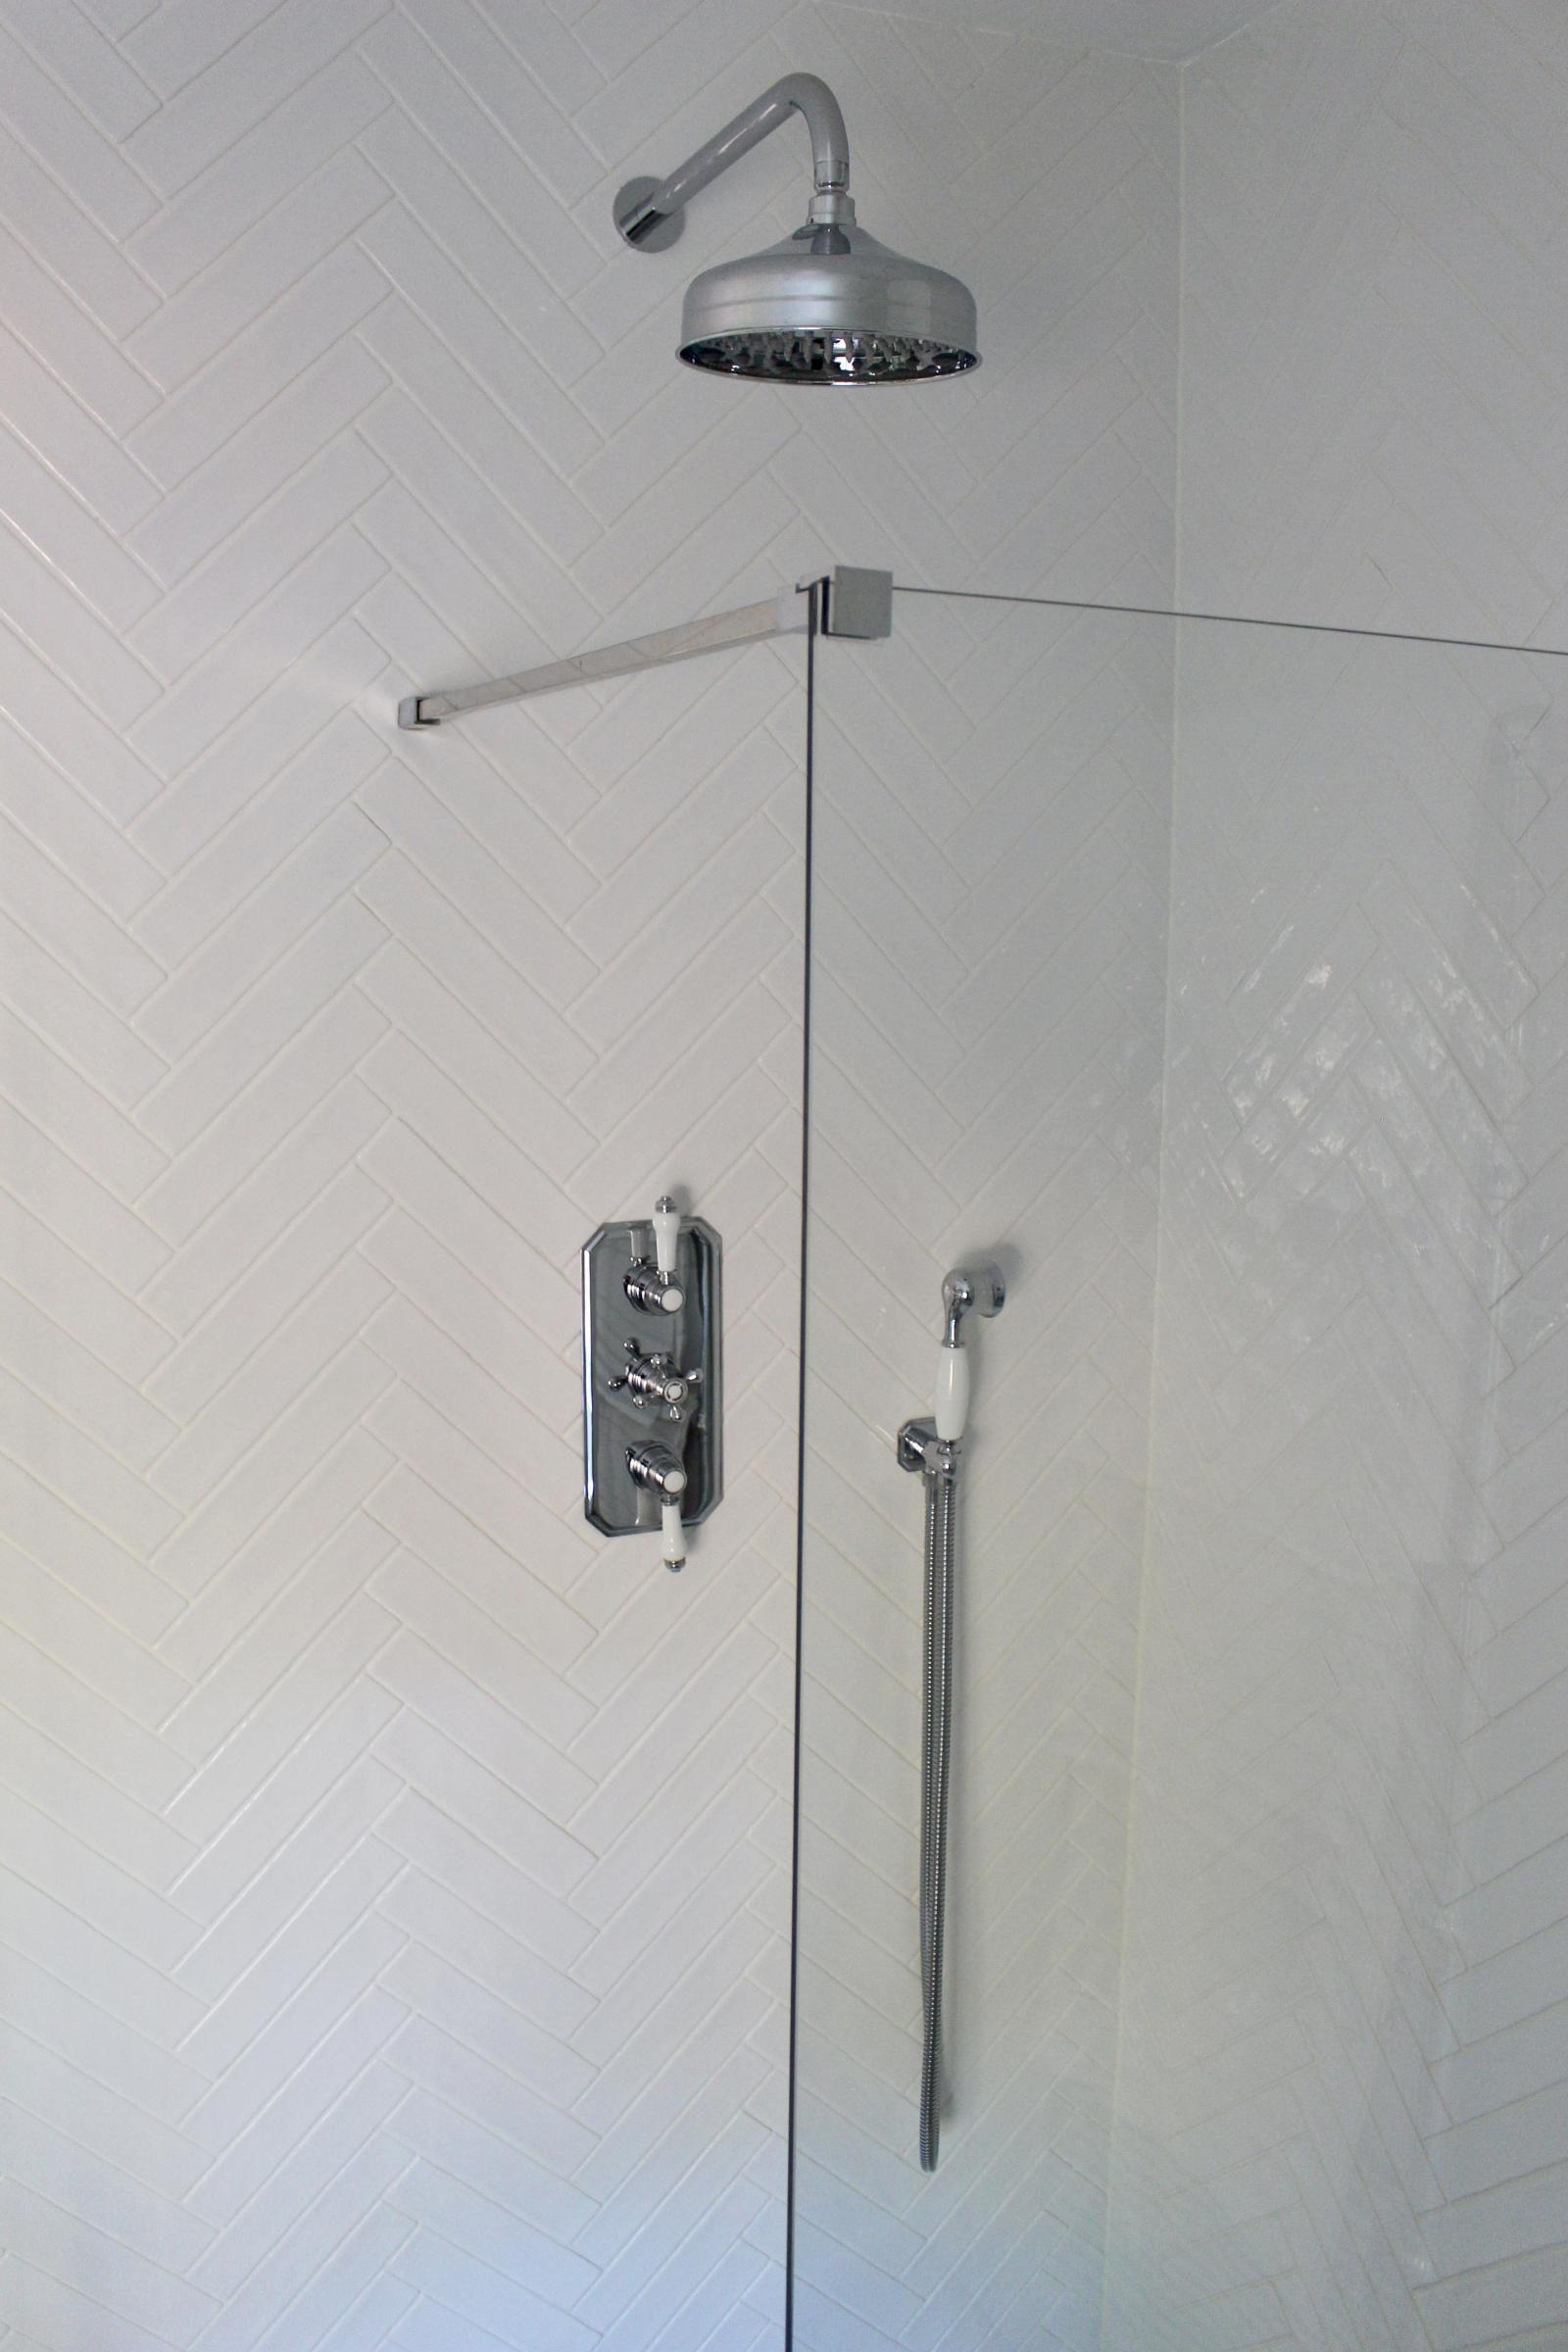 New family bathroom - Cassellie shower enclosure